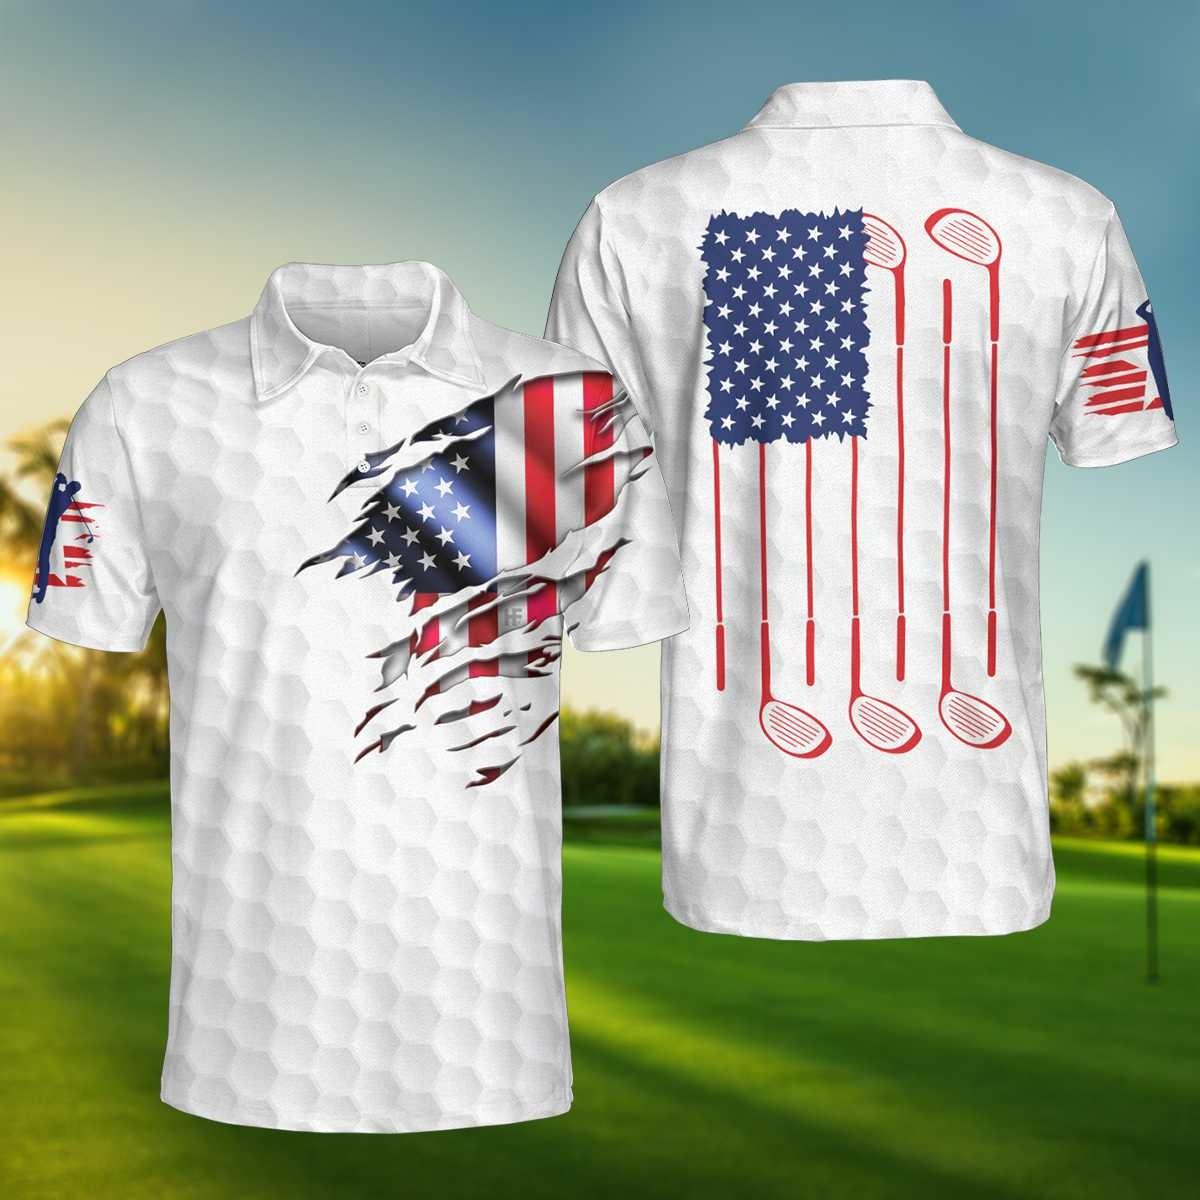 Golf American flag polo shirt2 1